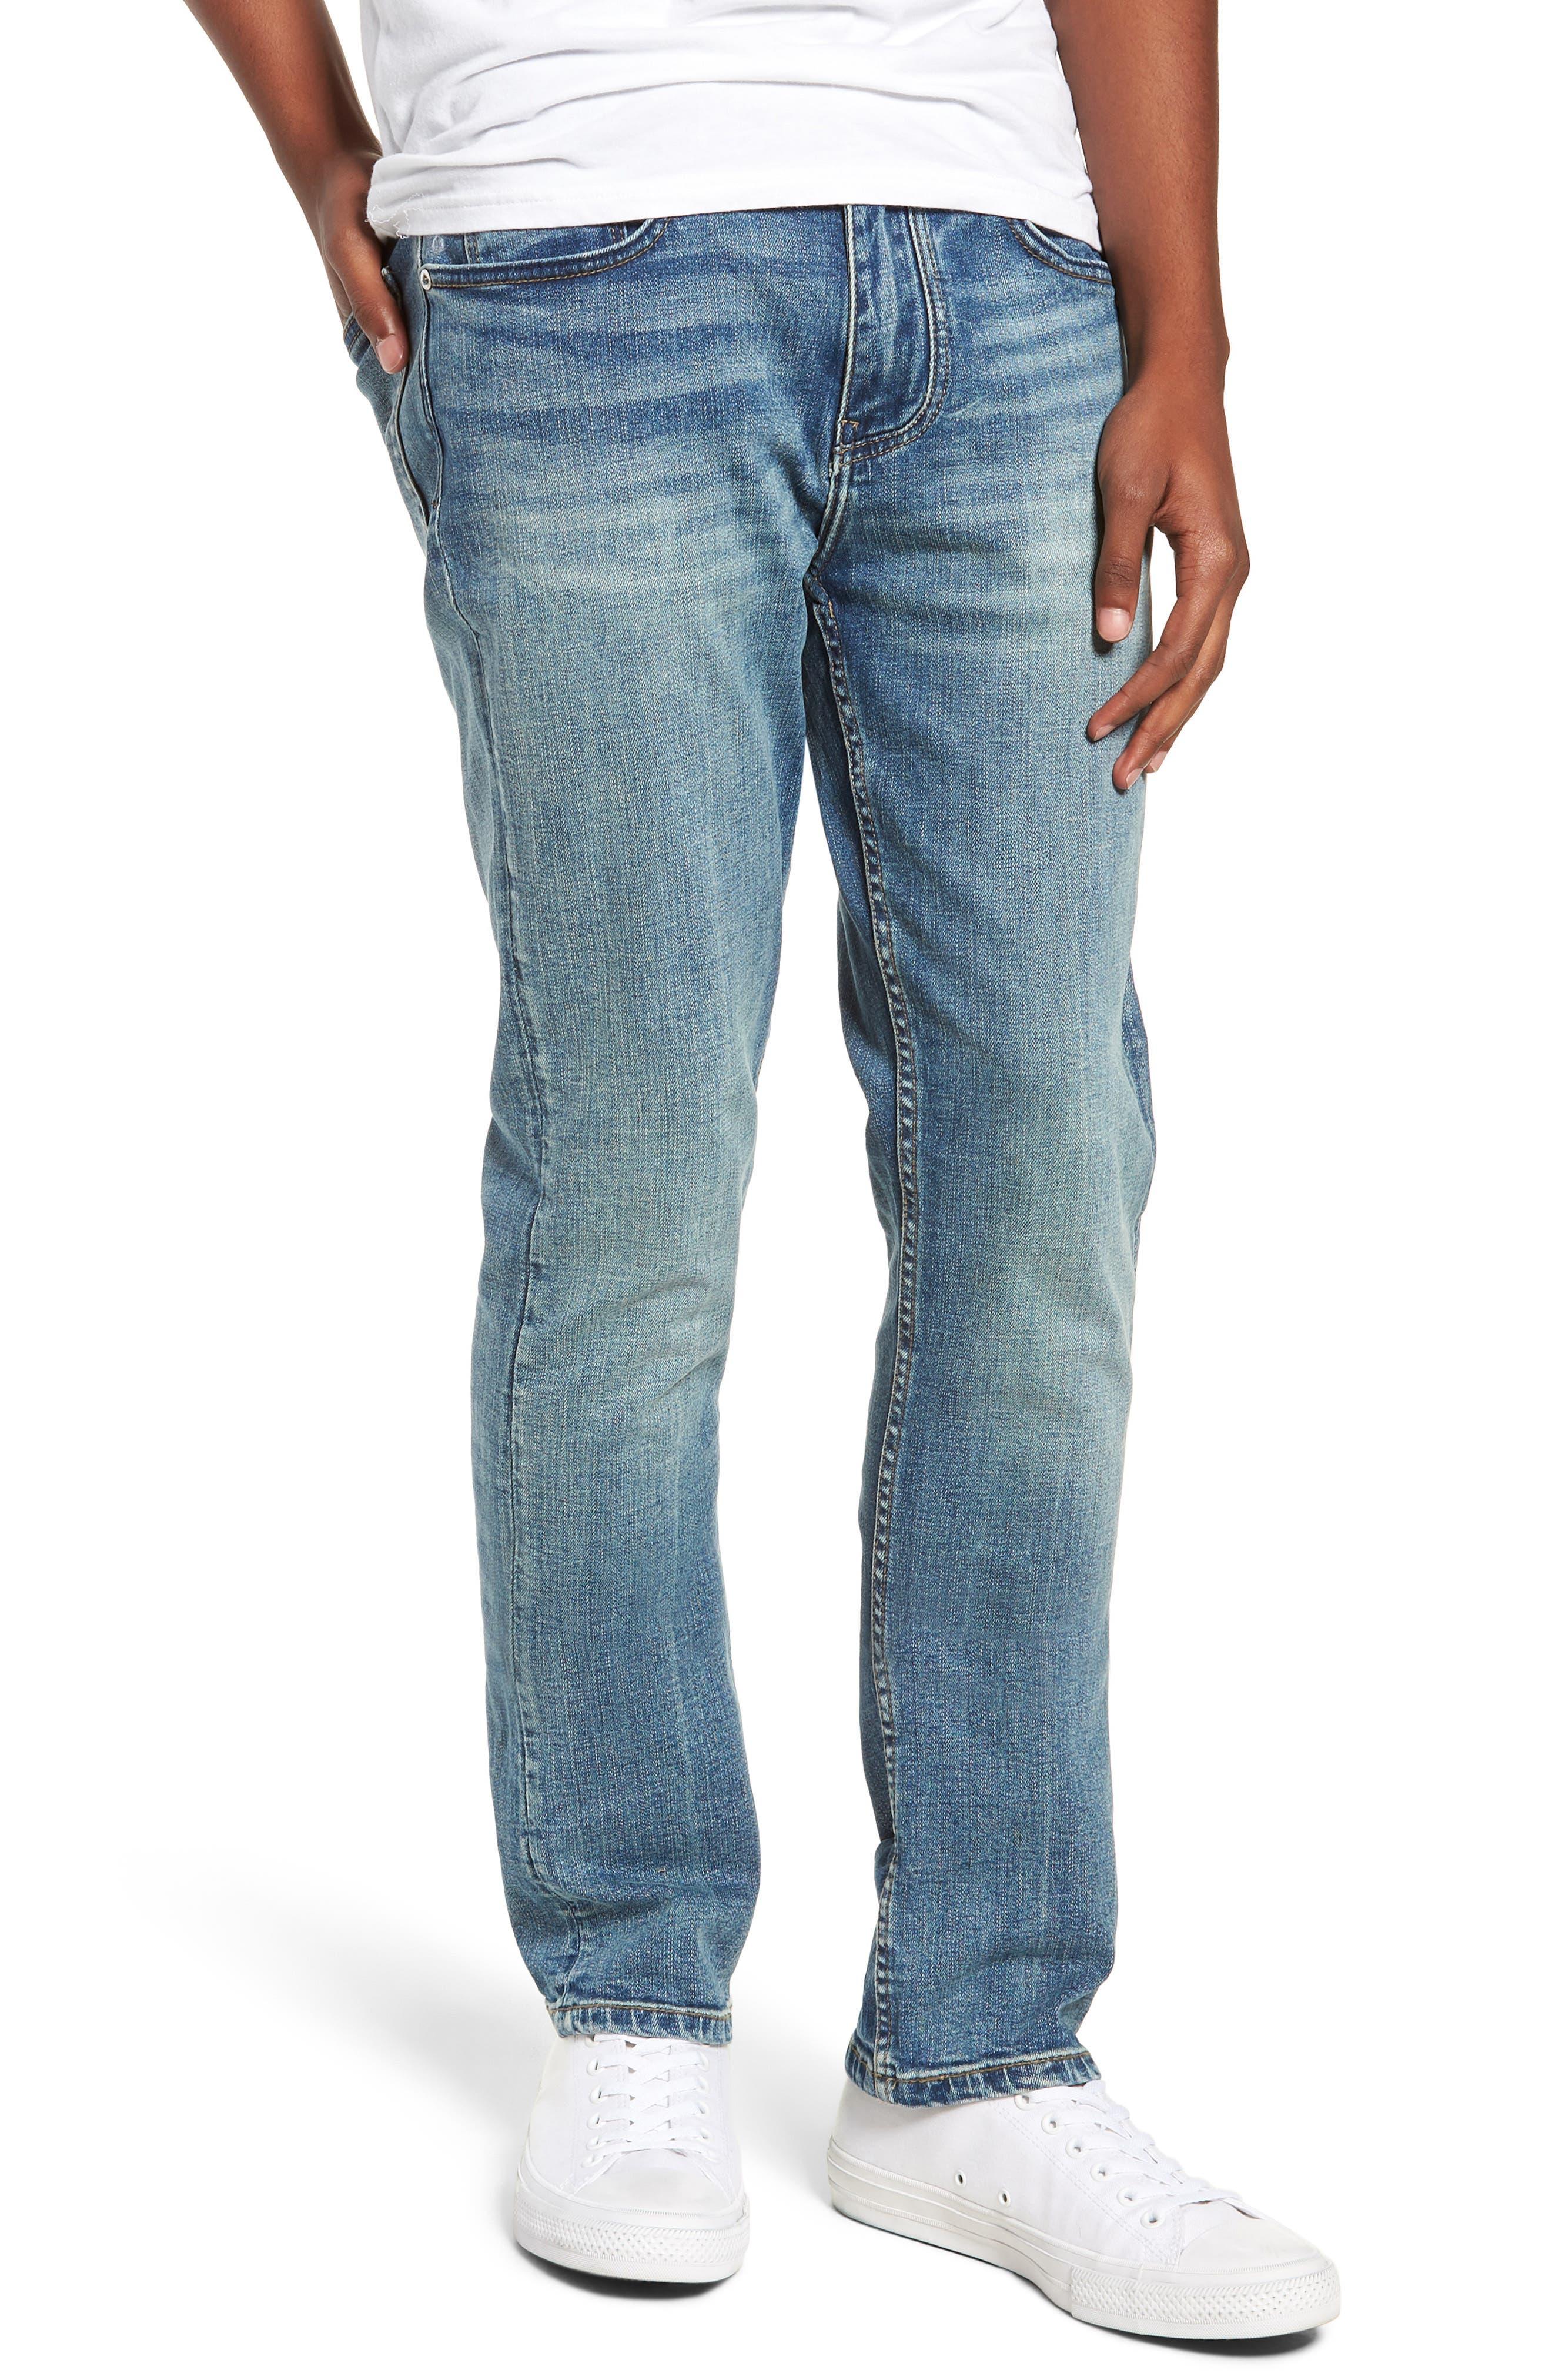 Wooster Selvedge Slim Fit Jeans,                         Main,                         color, LIGHT WORK